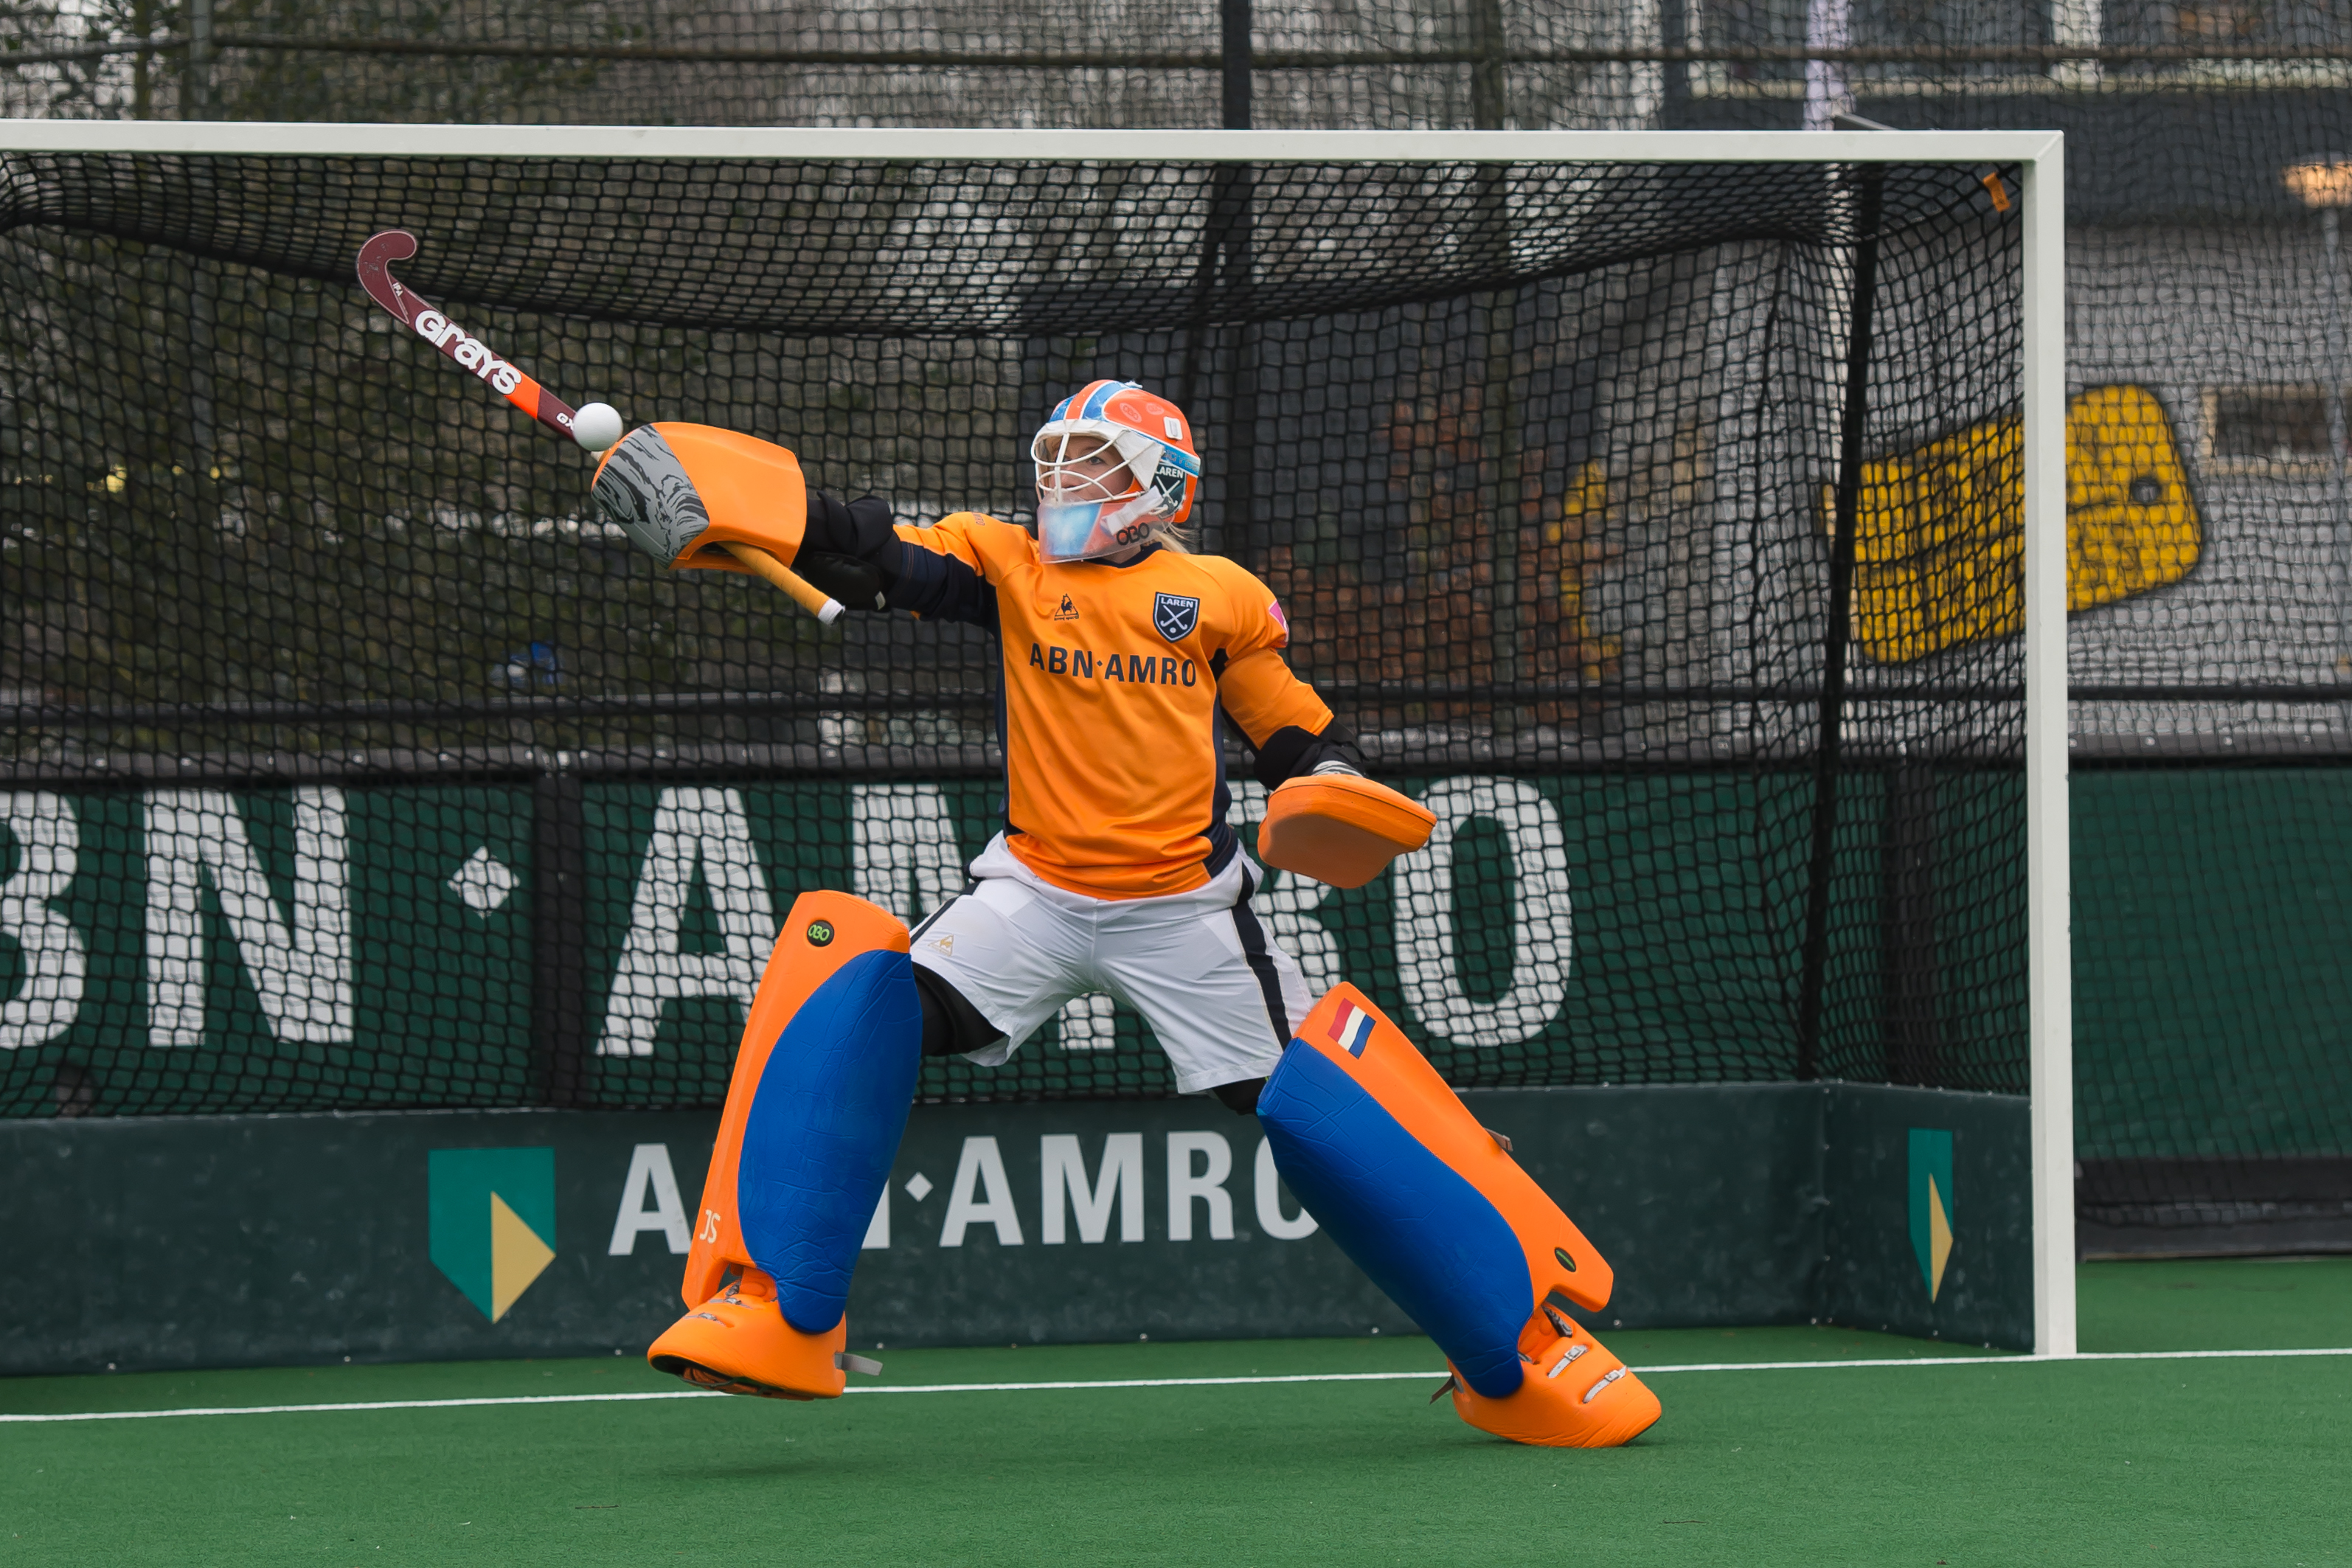 joyce-sombroek-keeperstraining-bart-van-gaalen-12-februai-2016-914-4